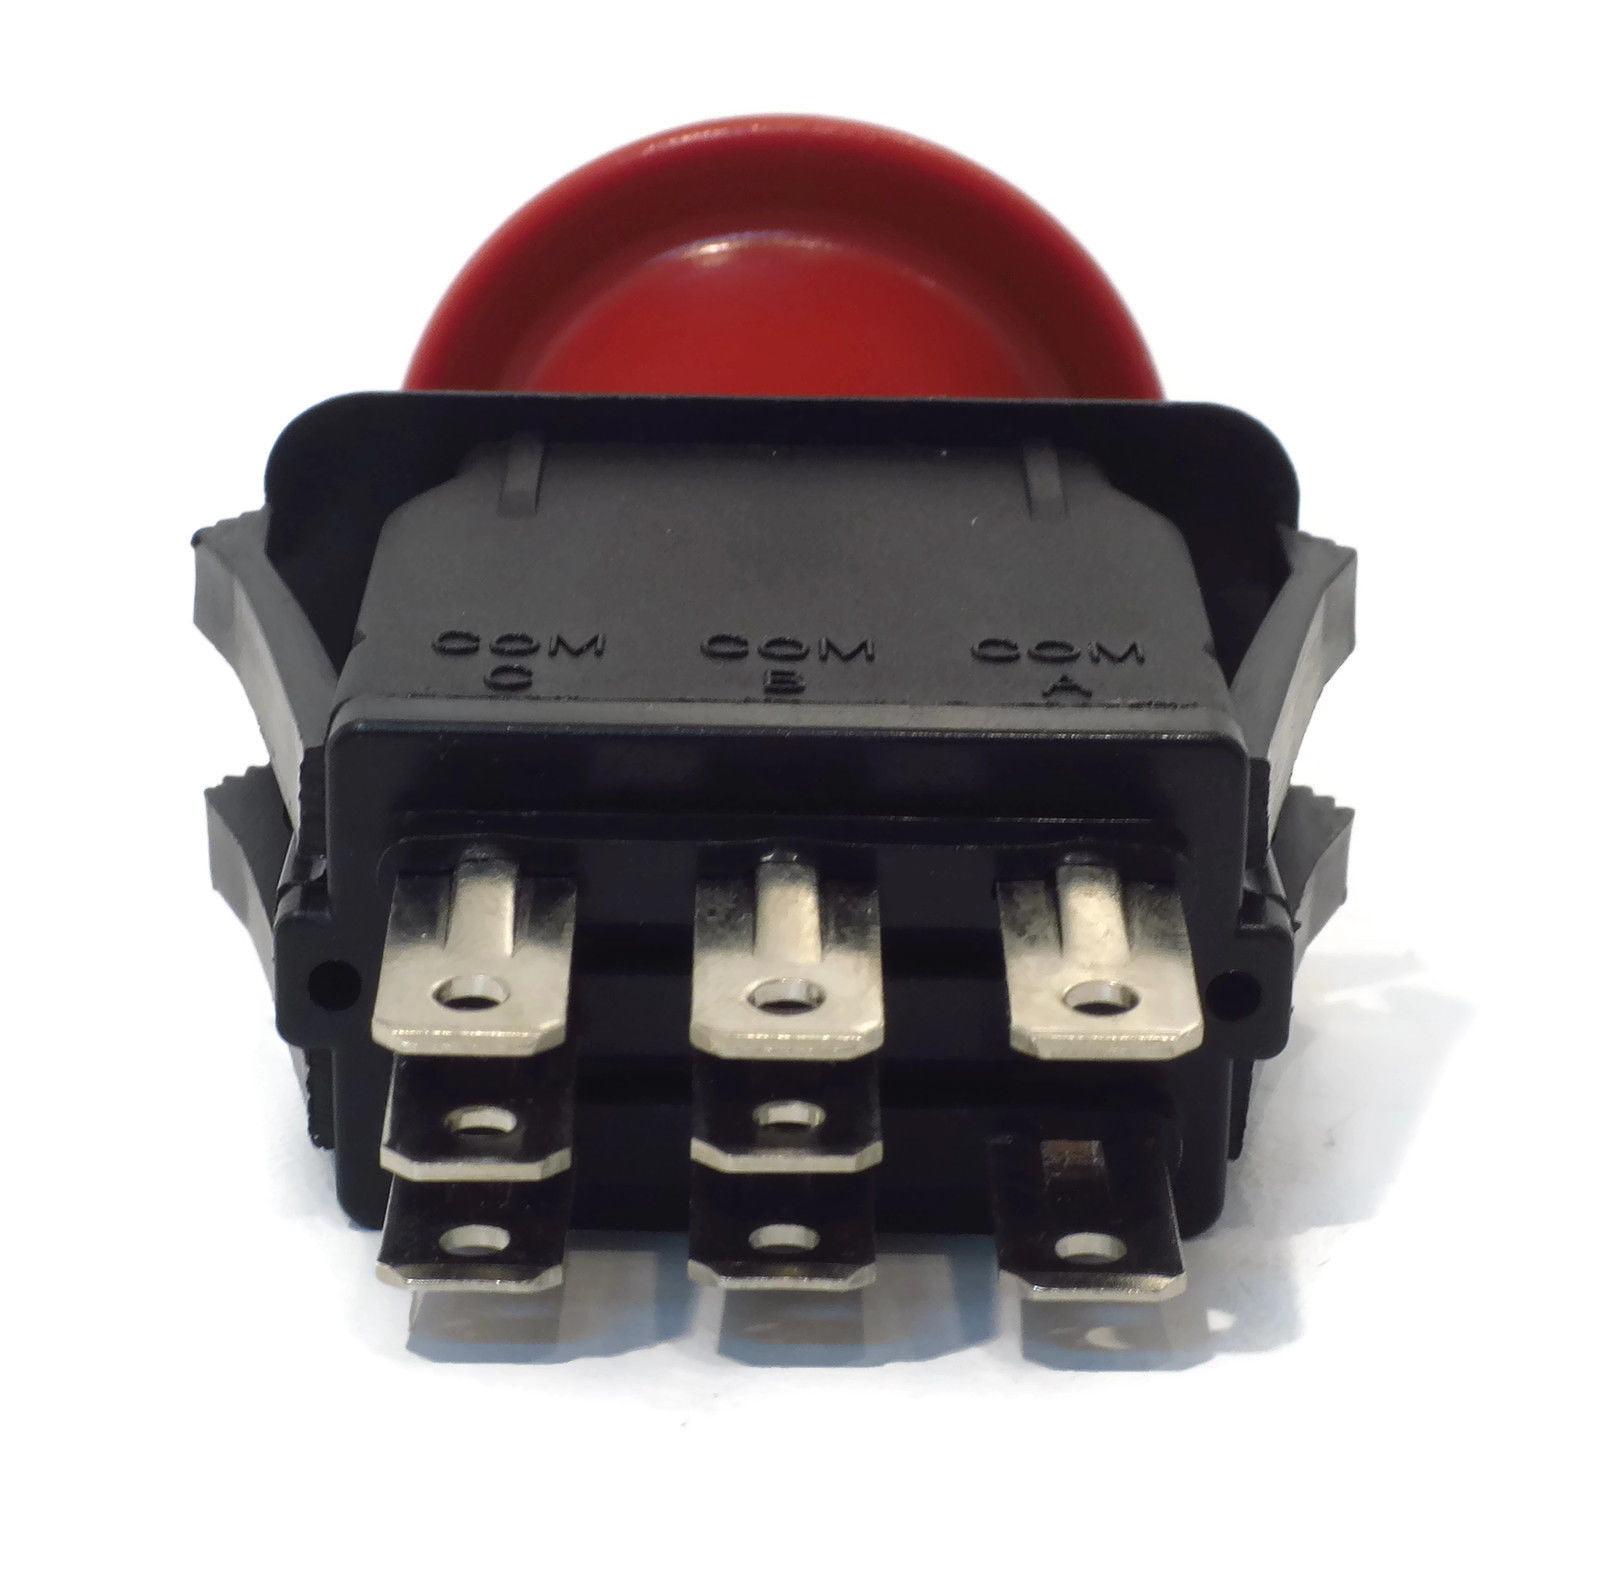 New Pto Clutch Switch Fits John Deere Z510a Z520a Z710a Z720a Z810a Wiring Harness Z820a Z830a